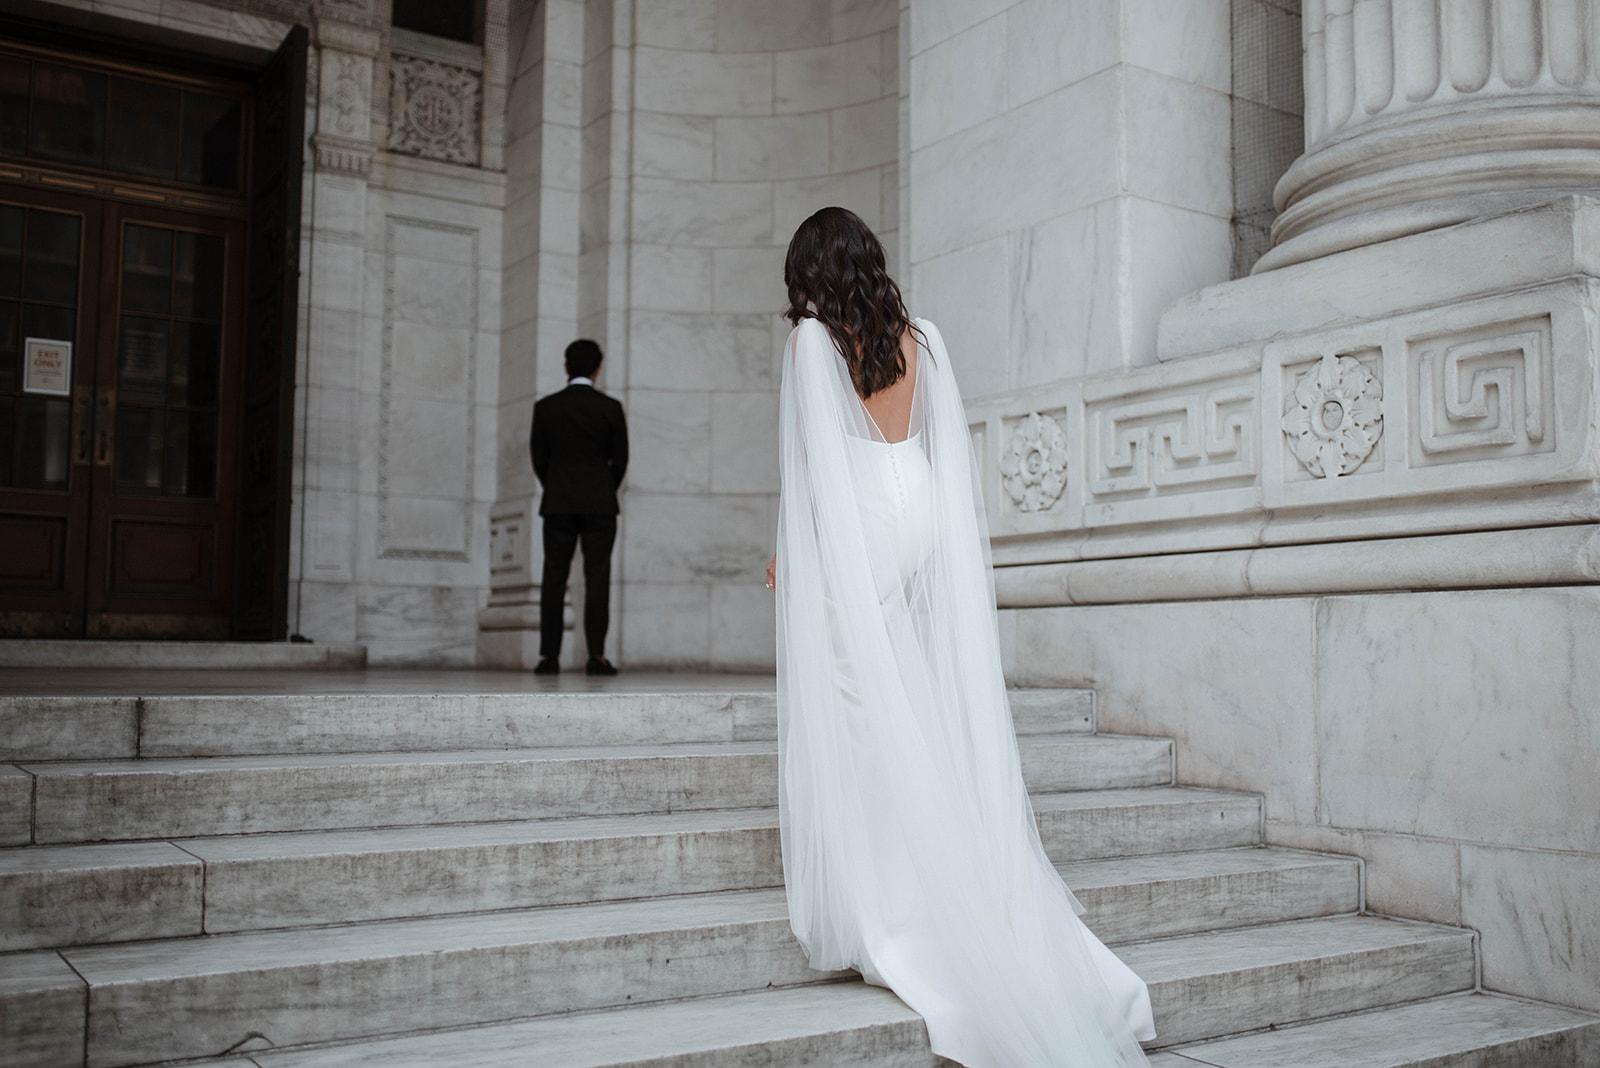 Jenna___Austin_Wedding_Day-_LHP-317.jpg